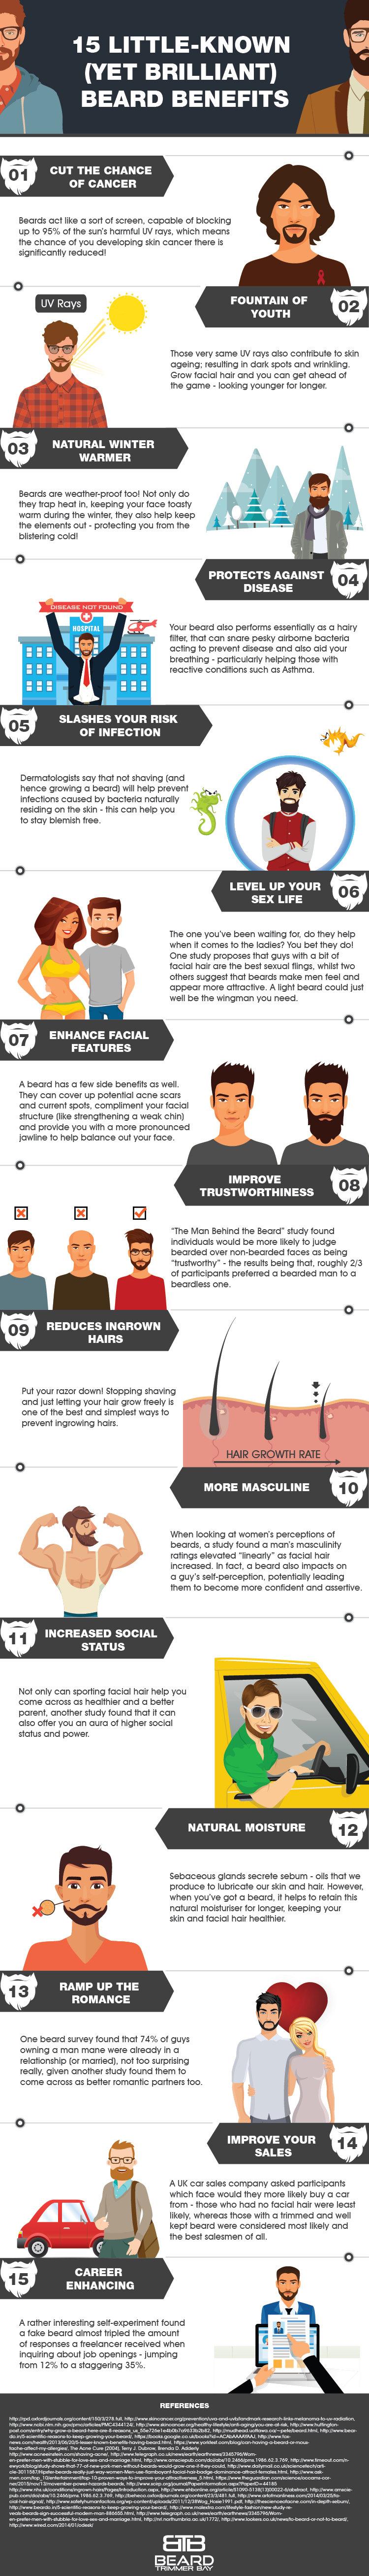 beard health benefits